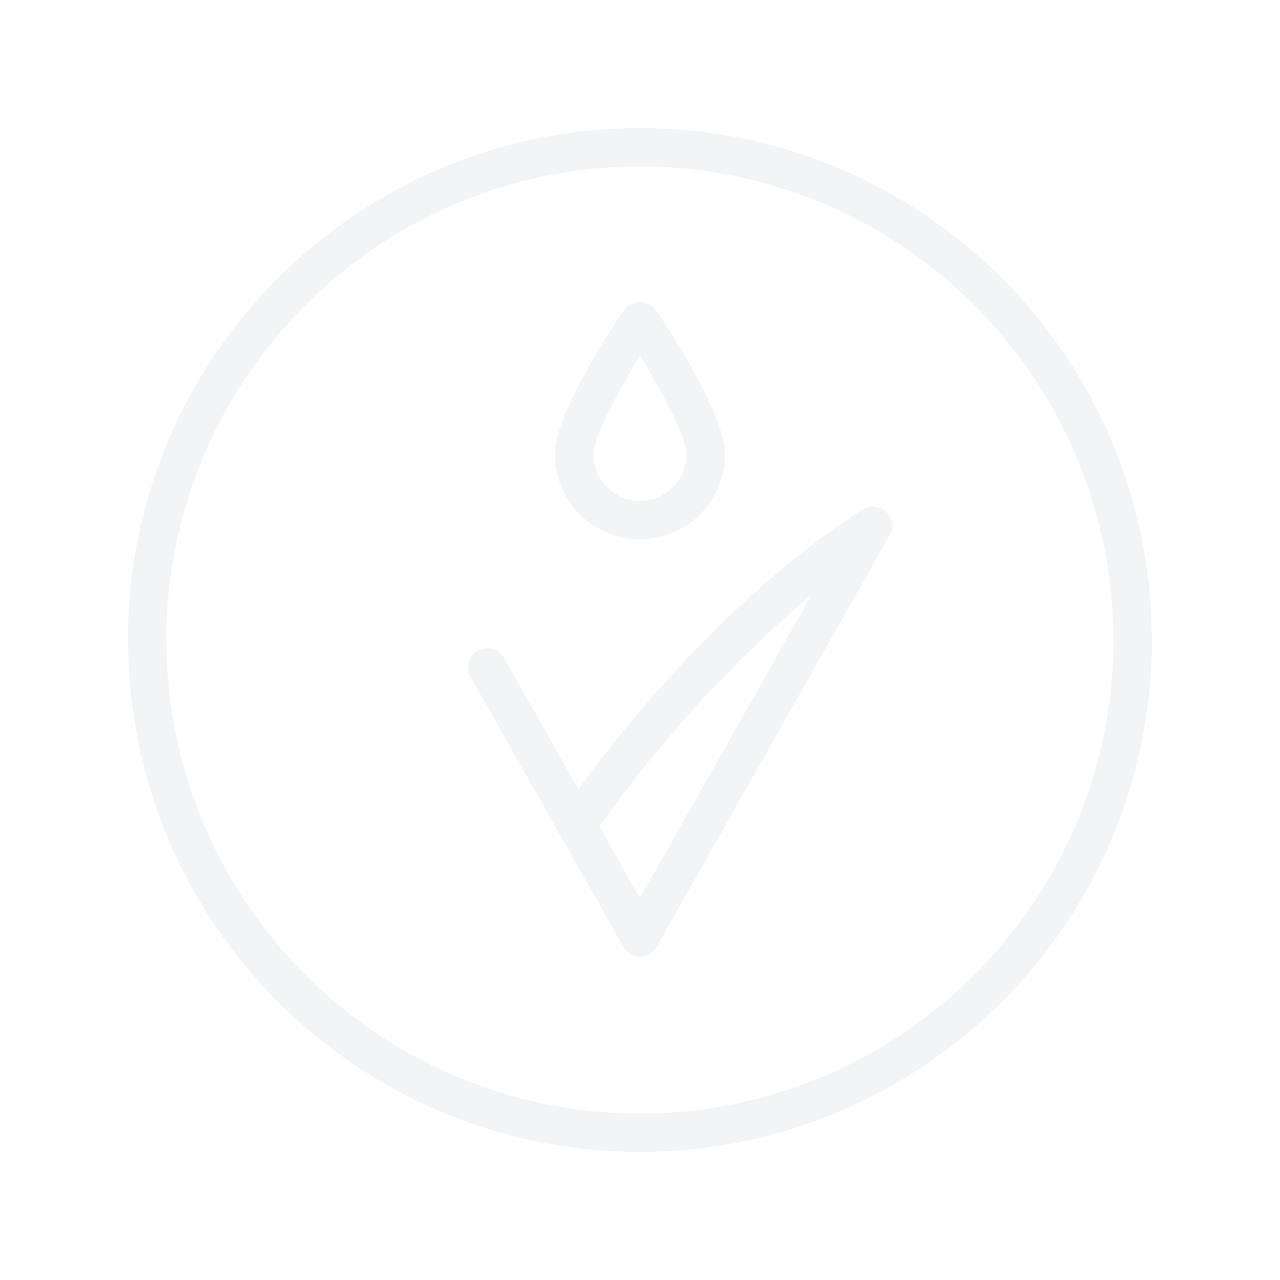 ELIZABETH ARDEN Skin Illuminating Moisturizer 50ml